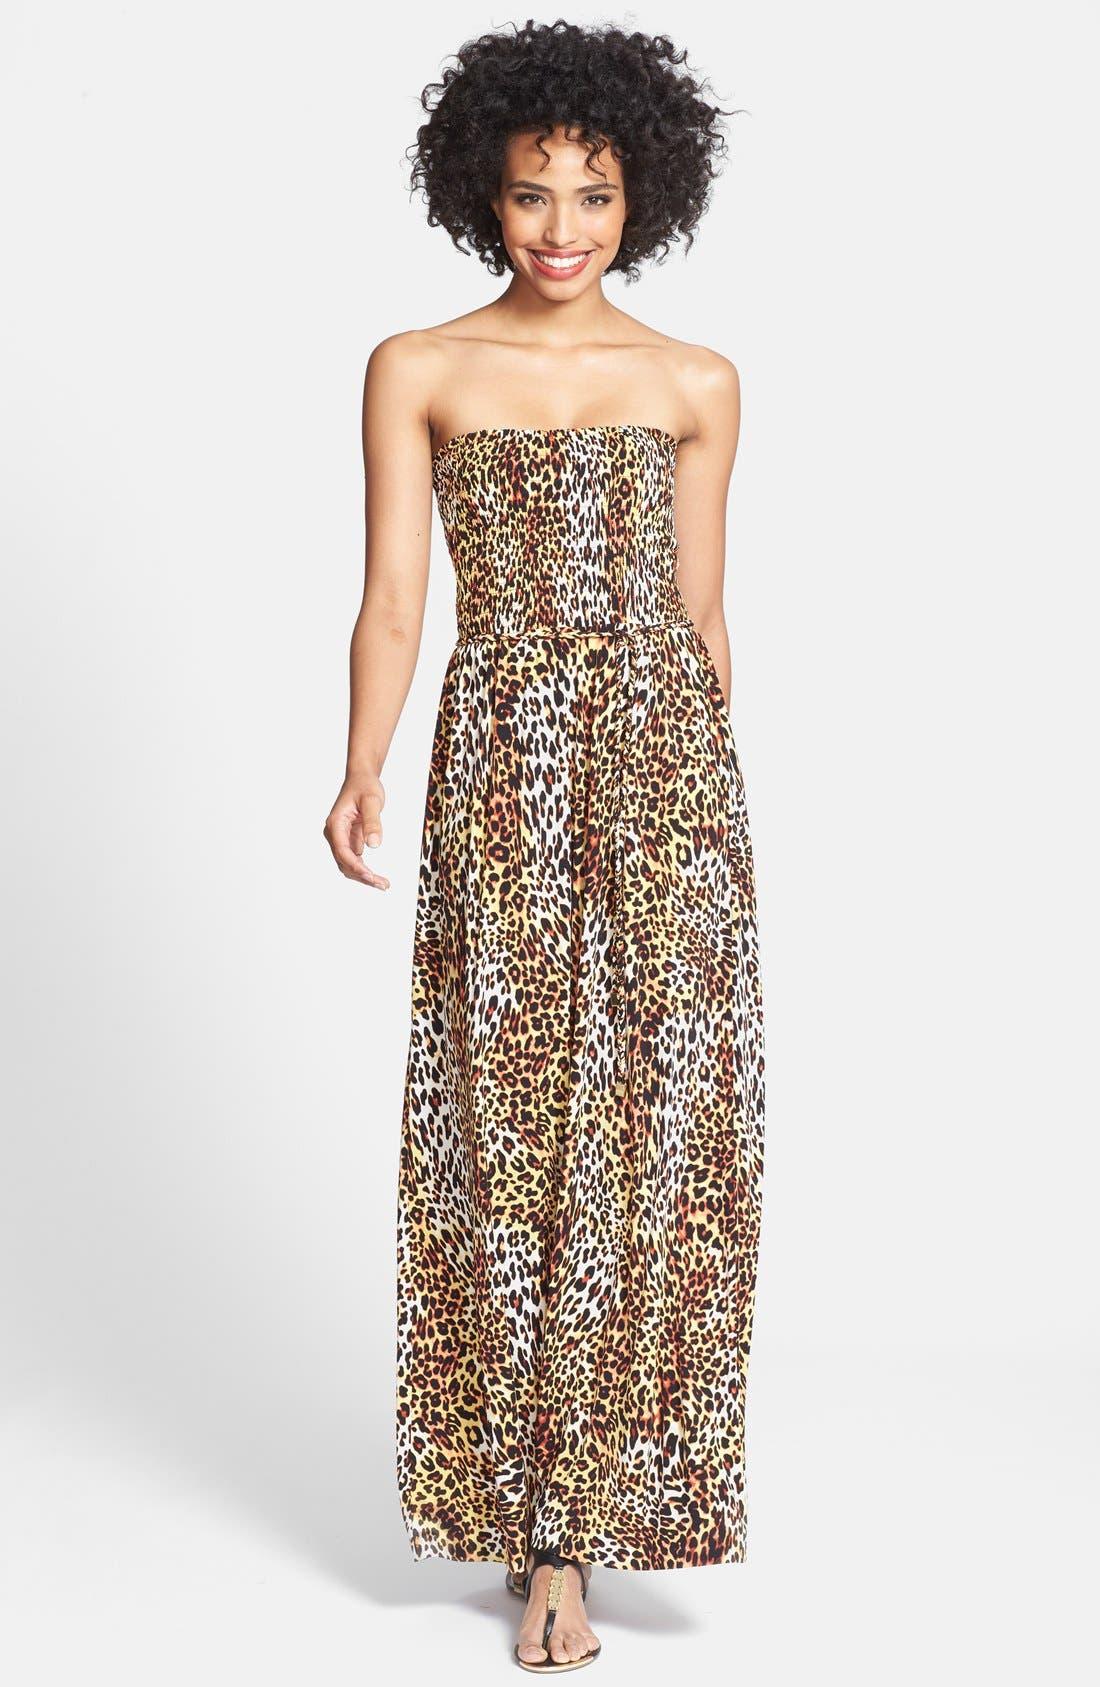 Main Image - Anne Klein Leopard Print Strapless Maxi Dress (Regular & Petite)